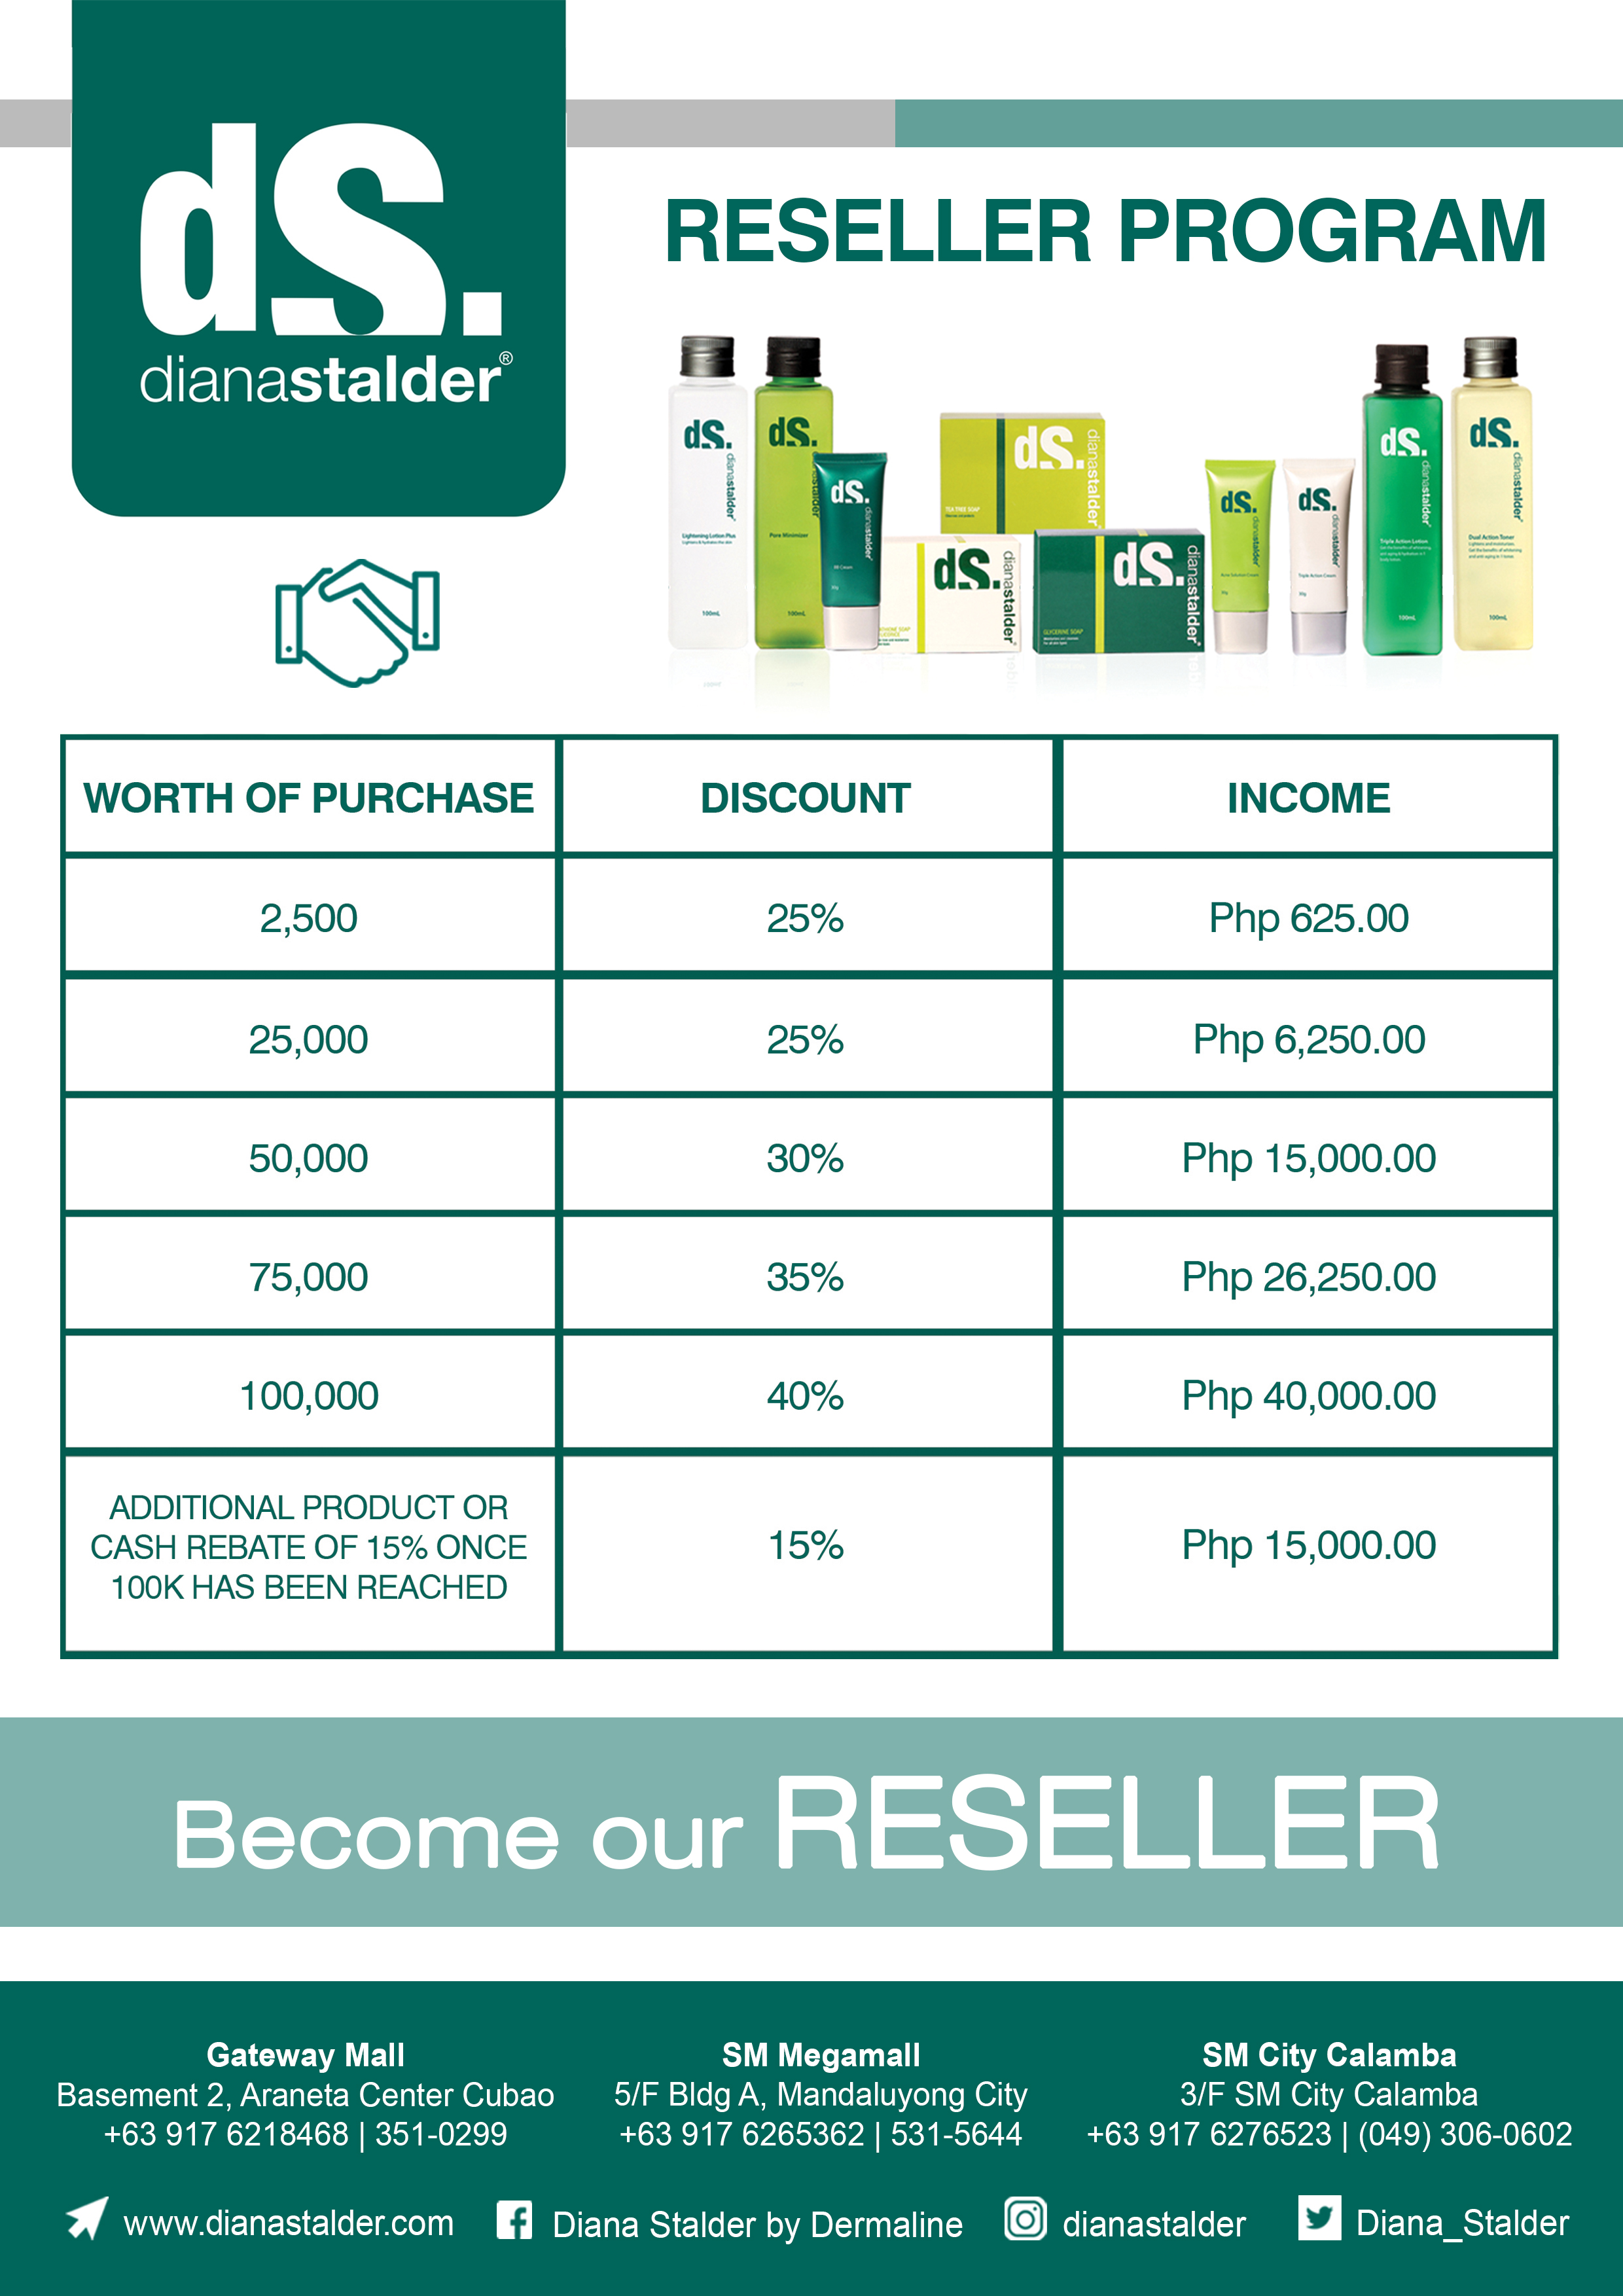 Diana Stalder Reseller Program